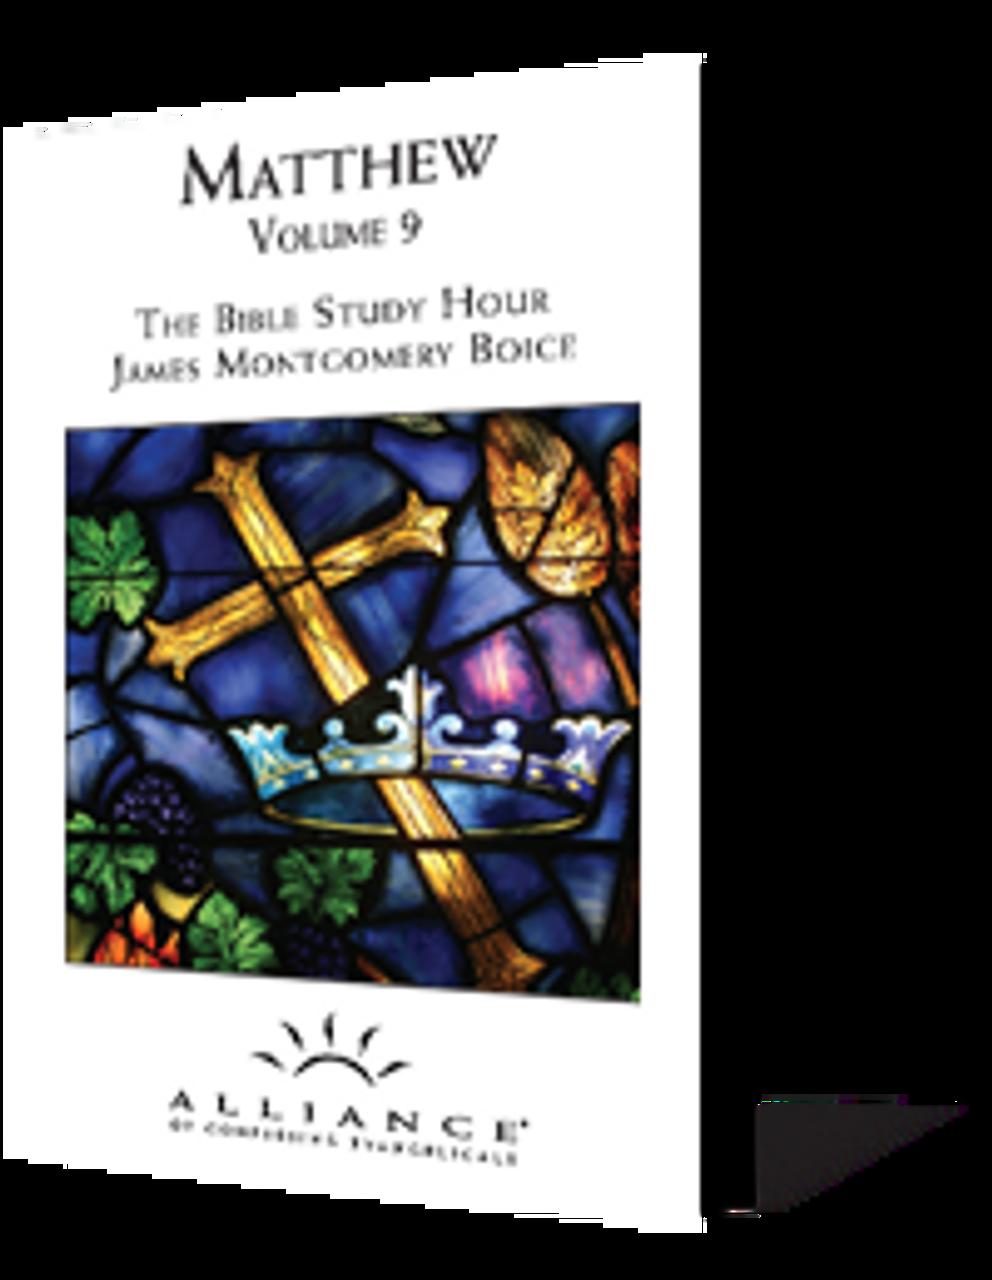 Matthew, Volume 9 (CD Set)